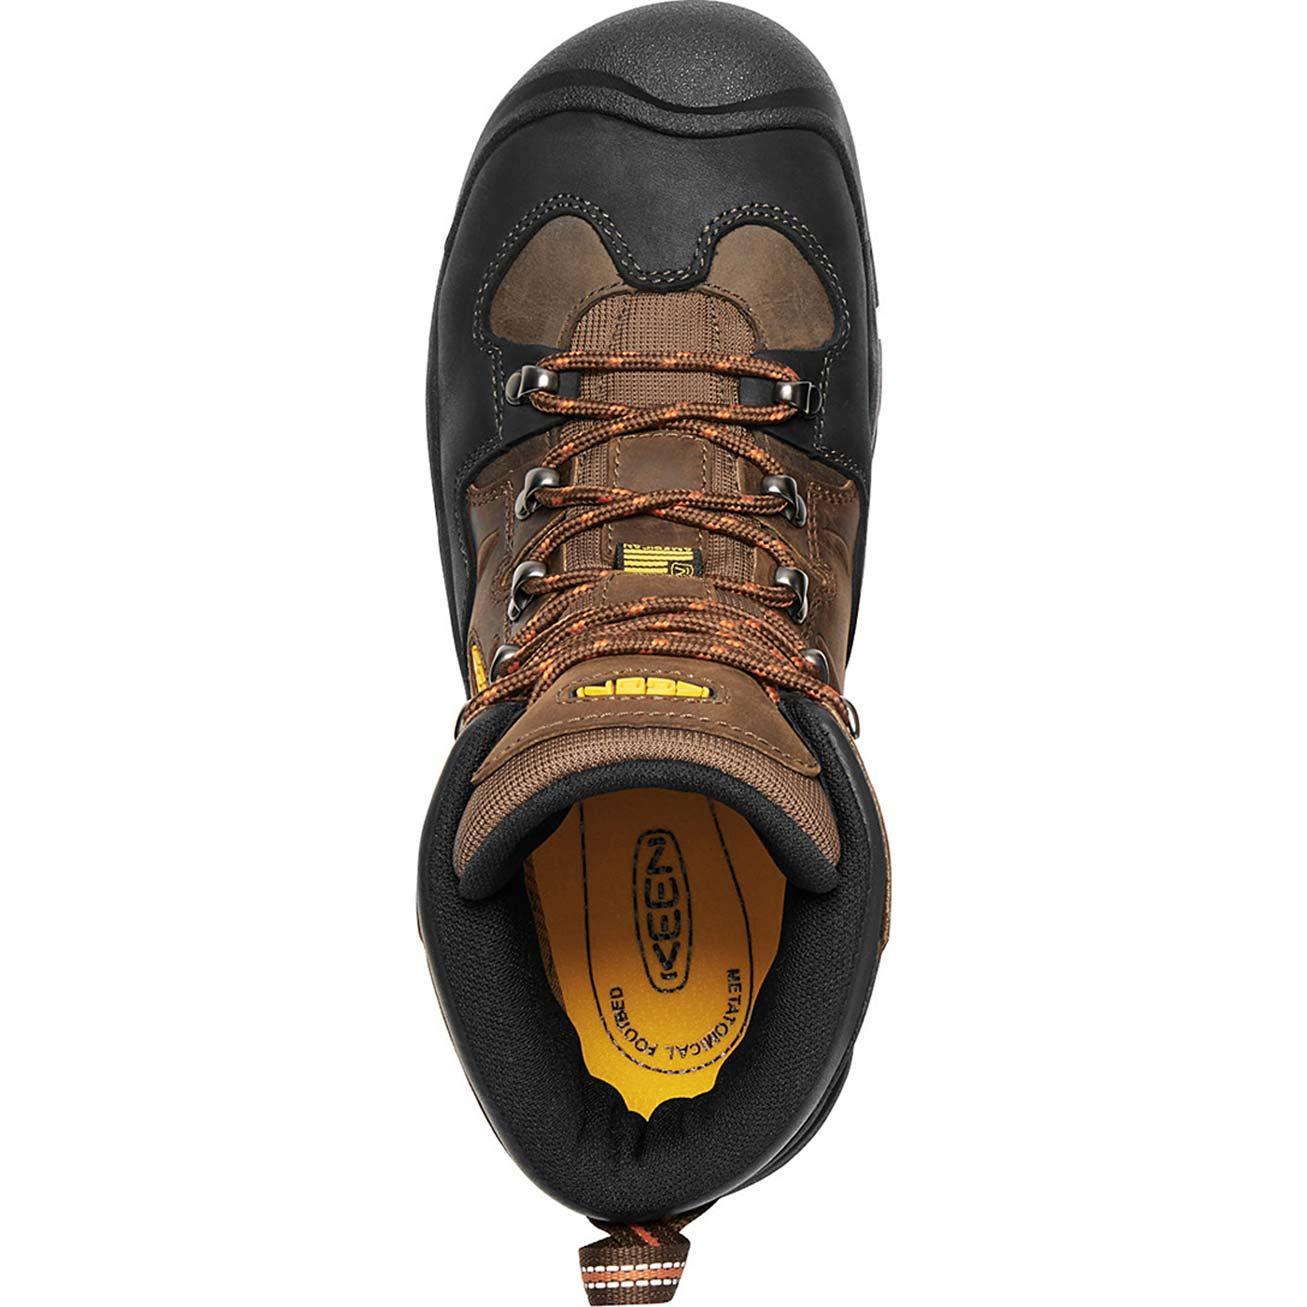 406aacfa649 KEEN Utility® Coburg Steel Toe Waterproof Work Boot